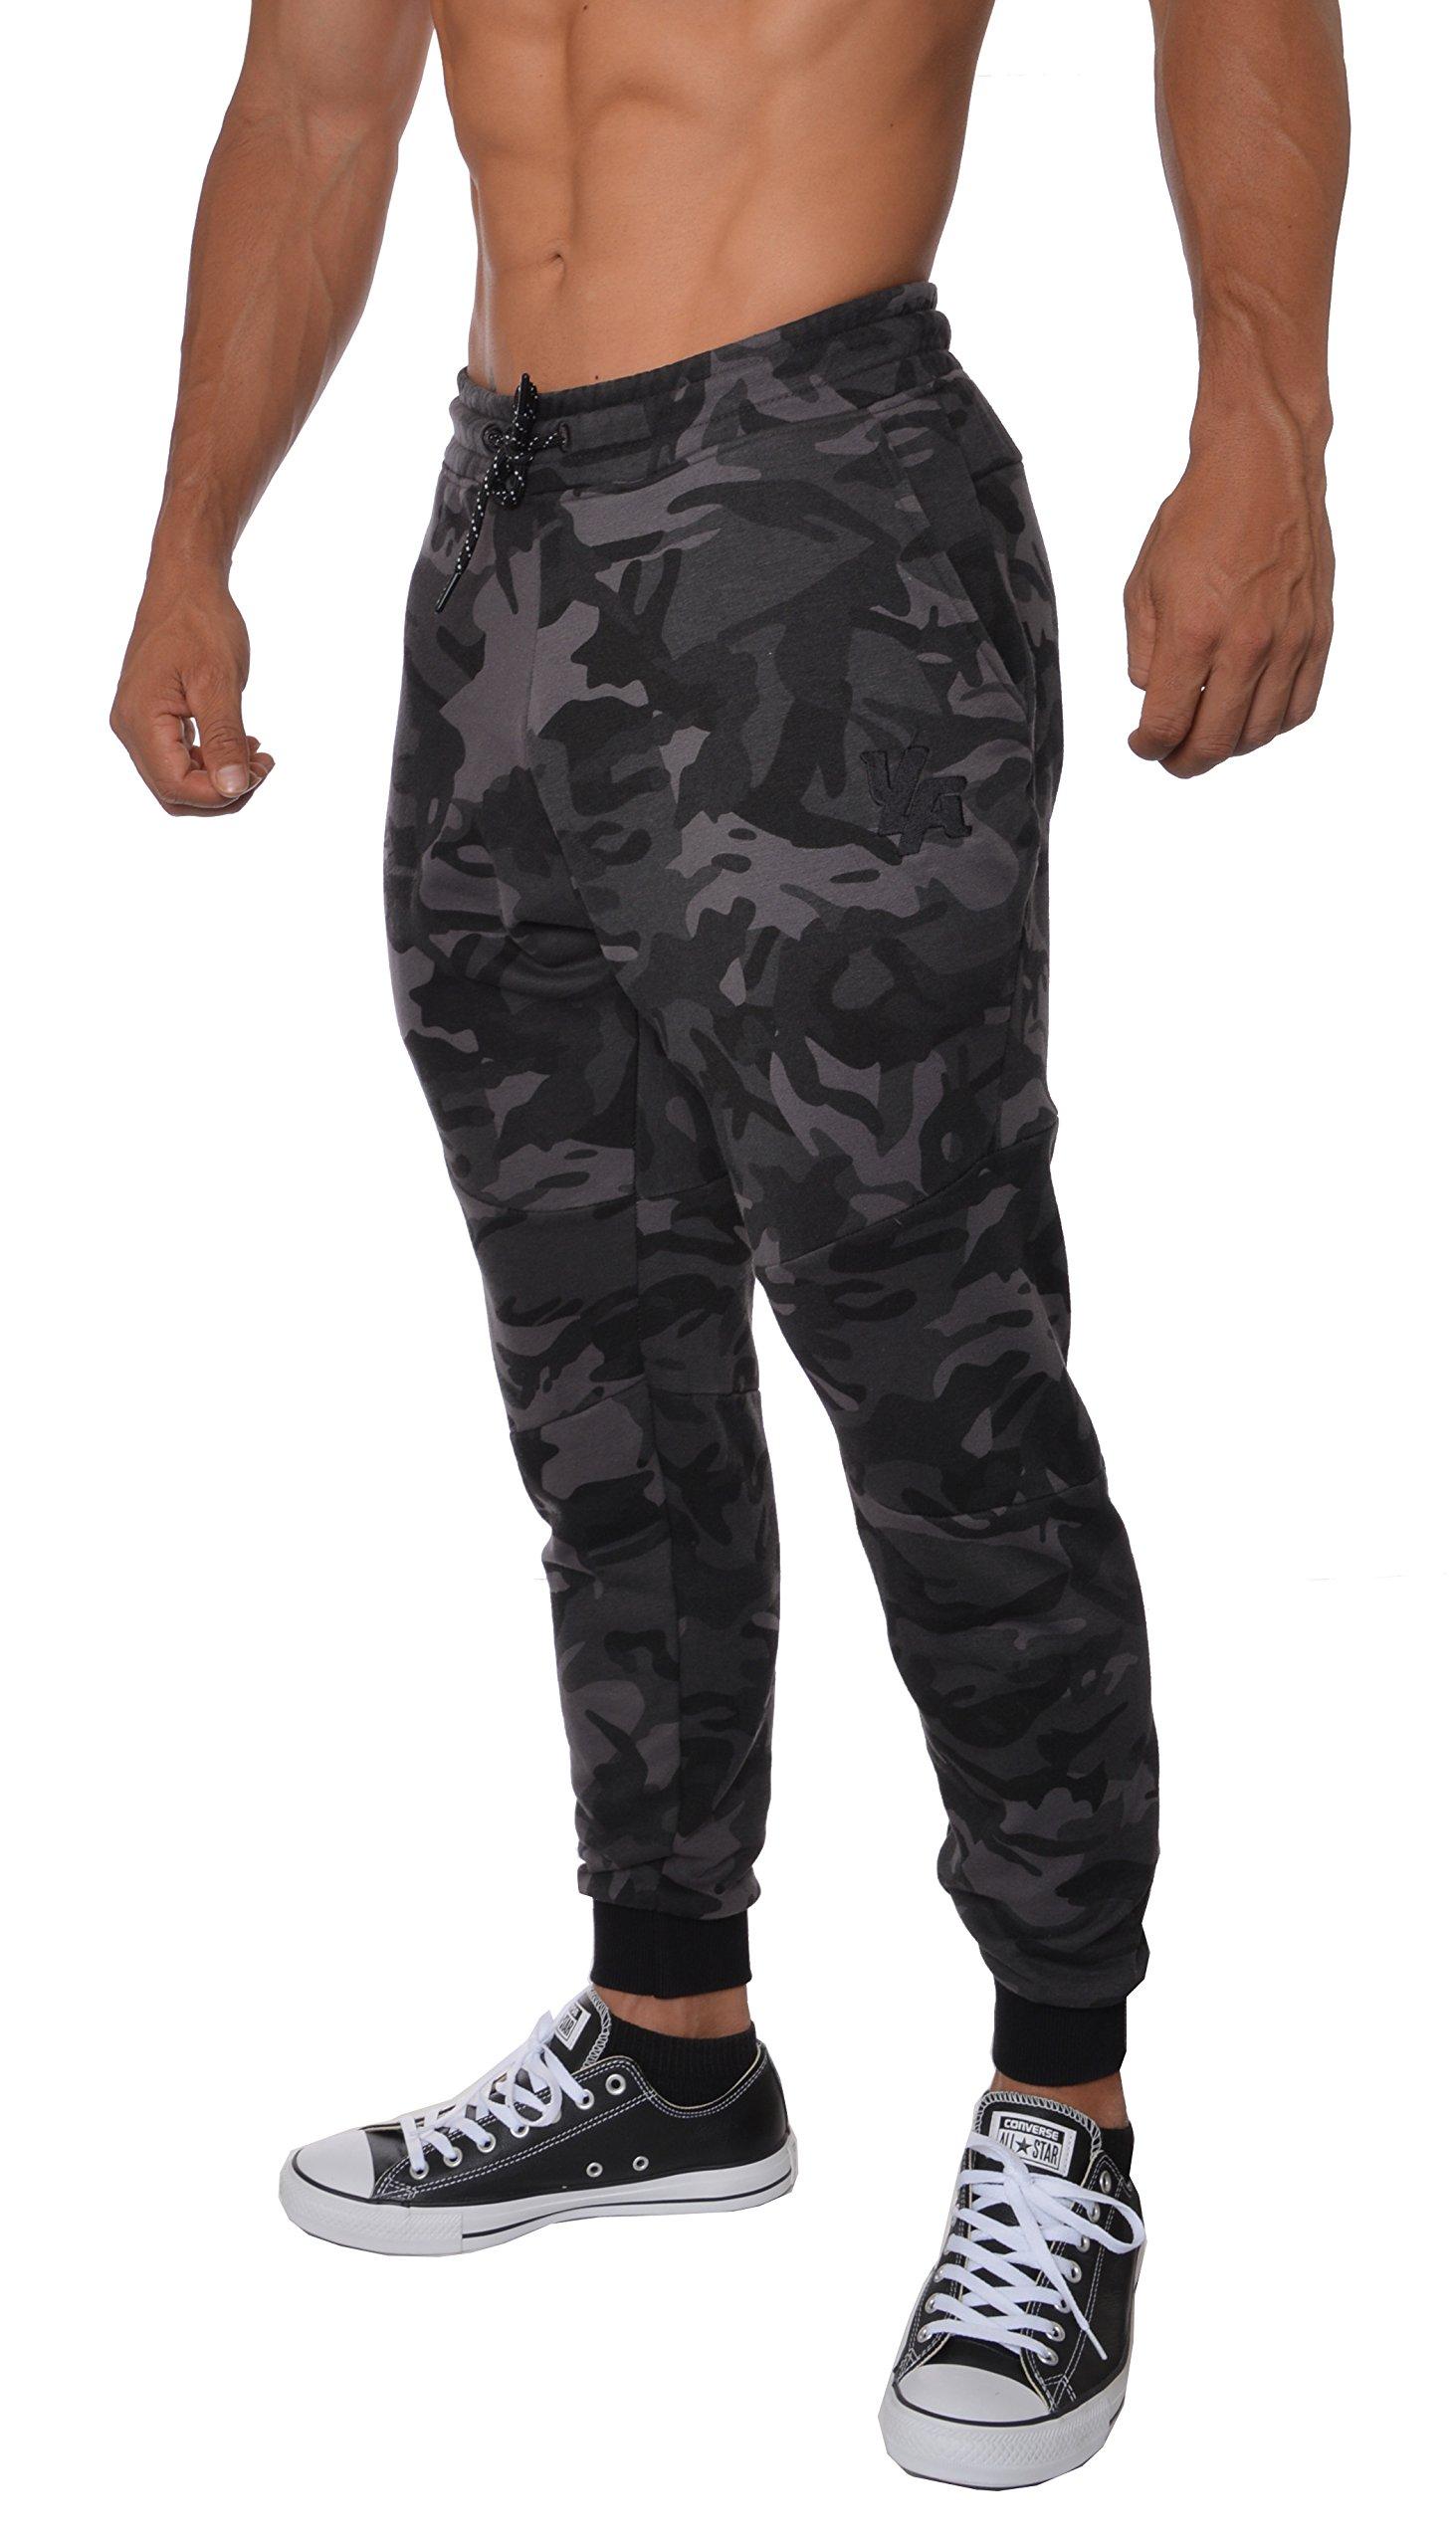 YoungLA French Terry Cotton Sweatpants Jogger Pants Camouflage Black Medium